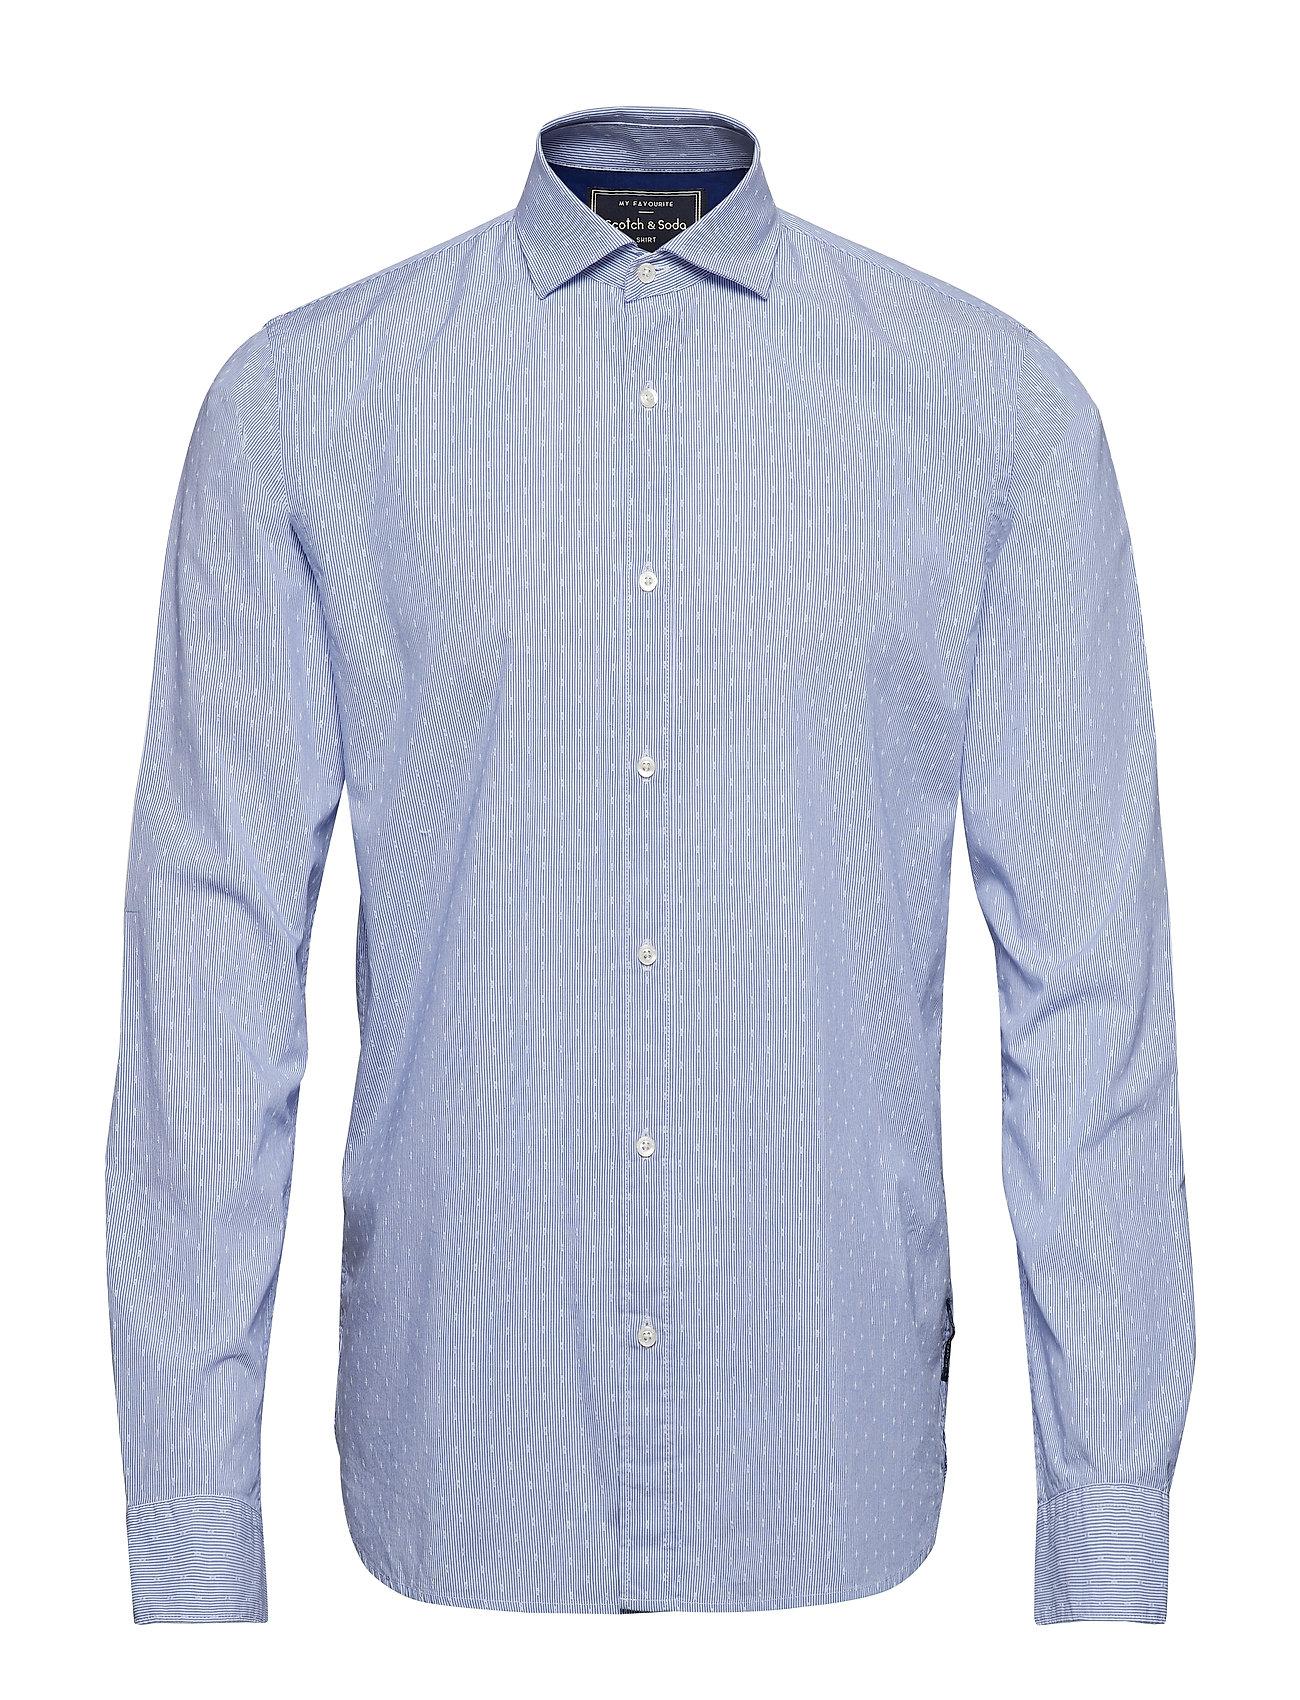 Scotch & Soda REGULAR FIT- Classic dress shirt in blue - COMBO D